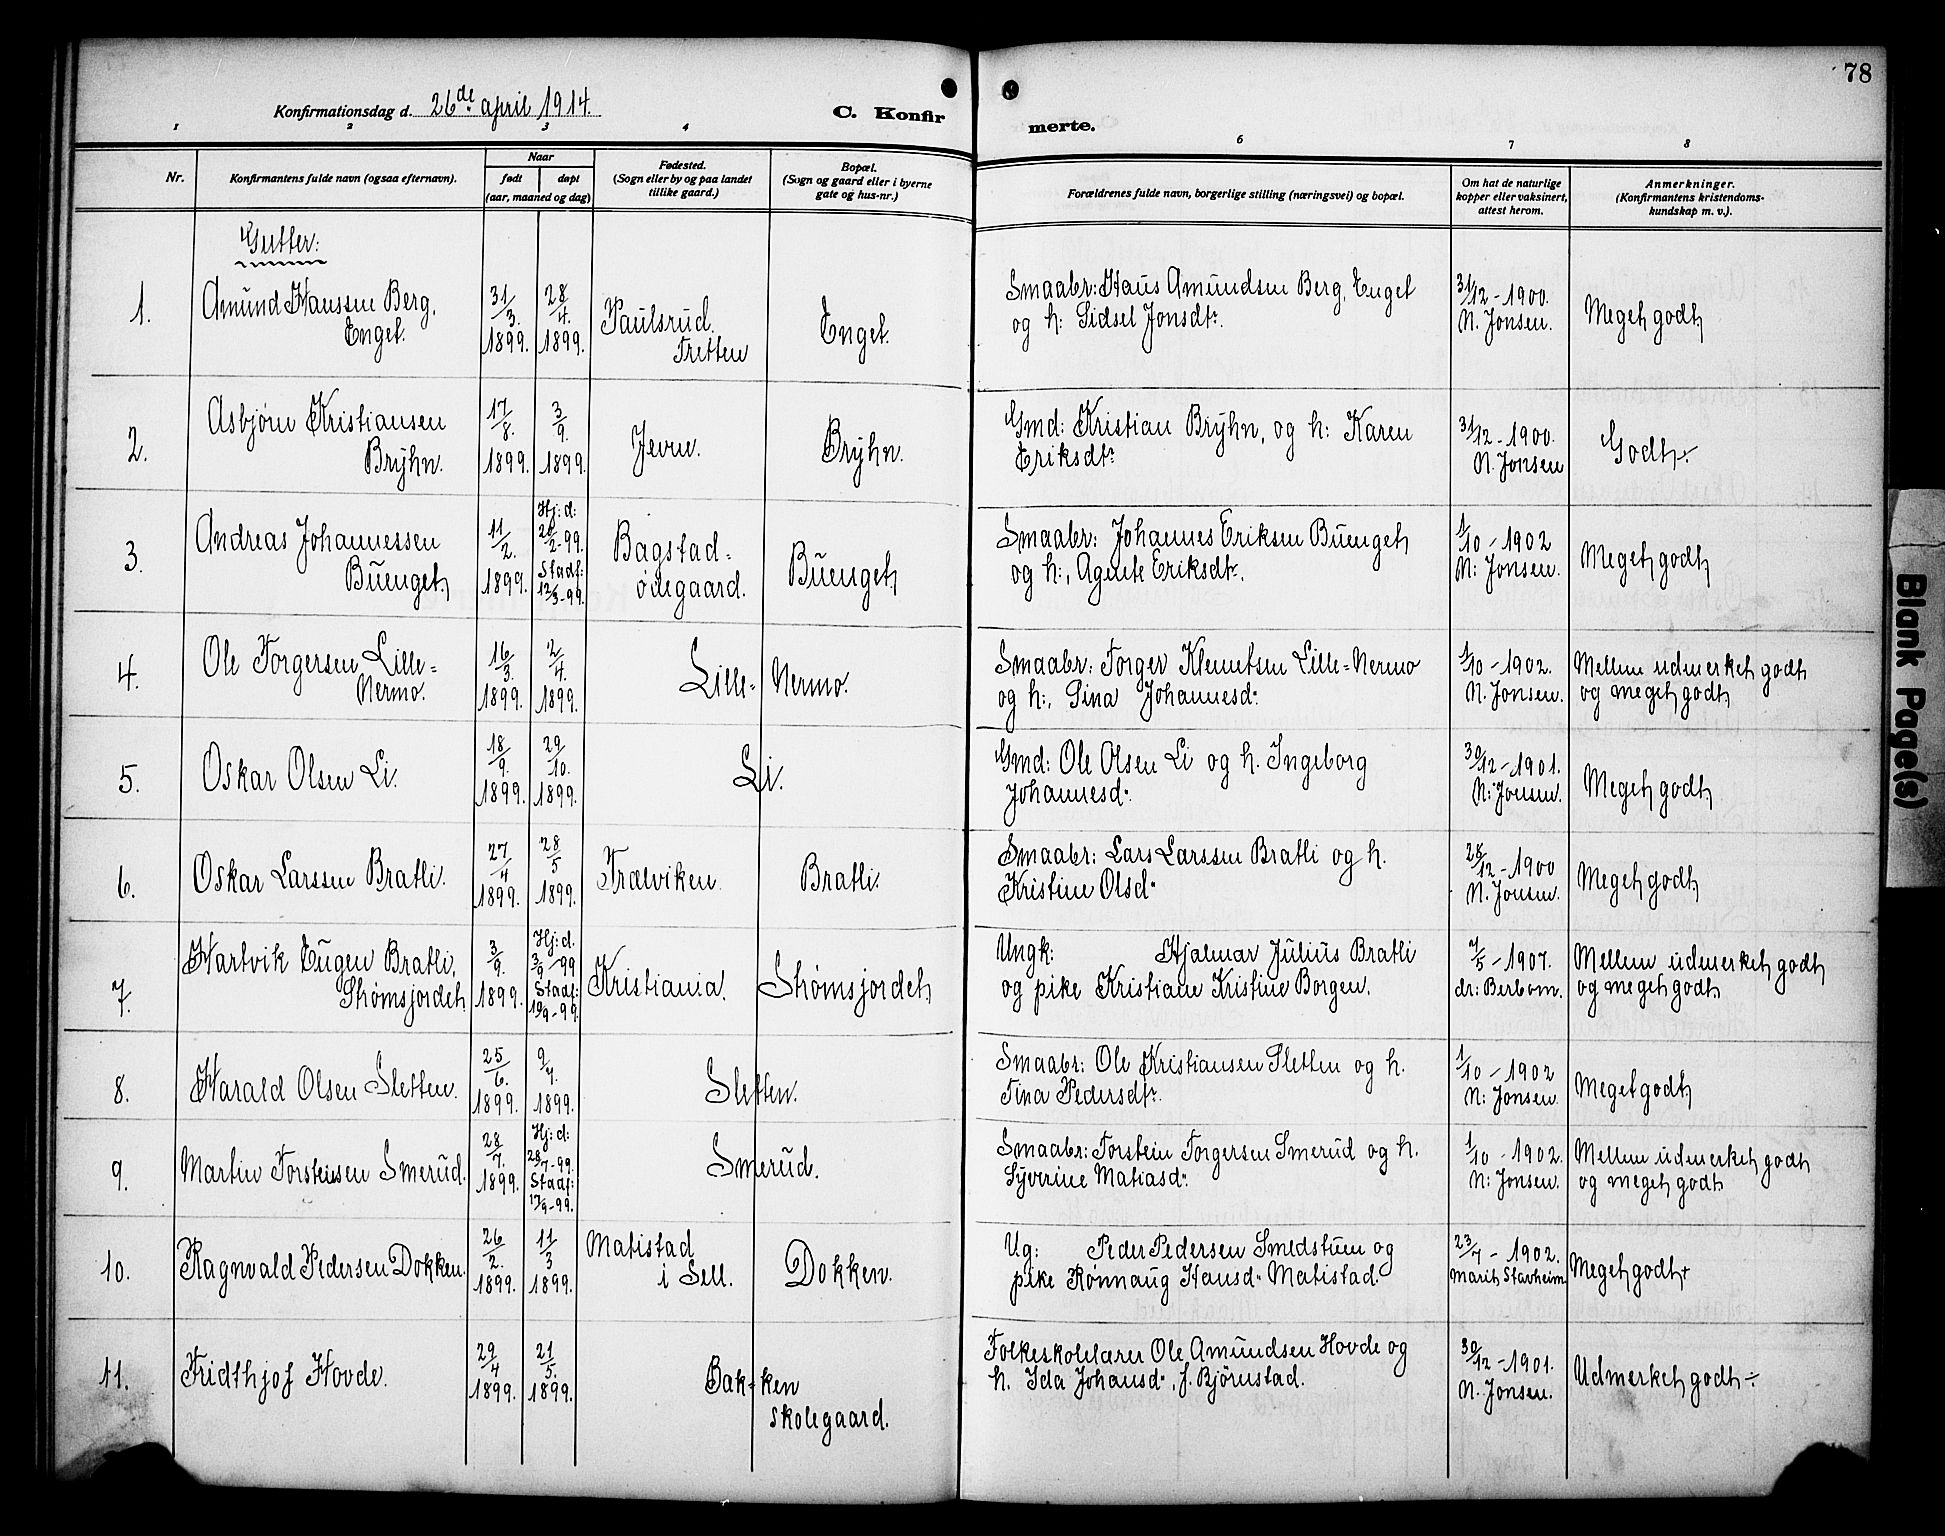 SAH, Øyer prestekontor, Klokkerbok nr. 7, 1913-1928, s. 78